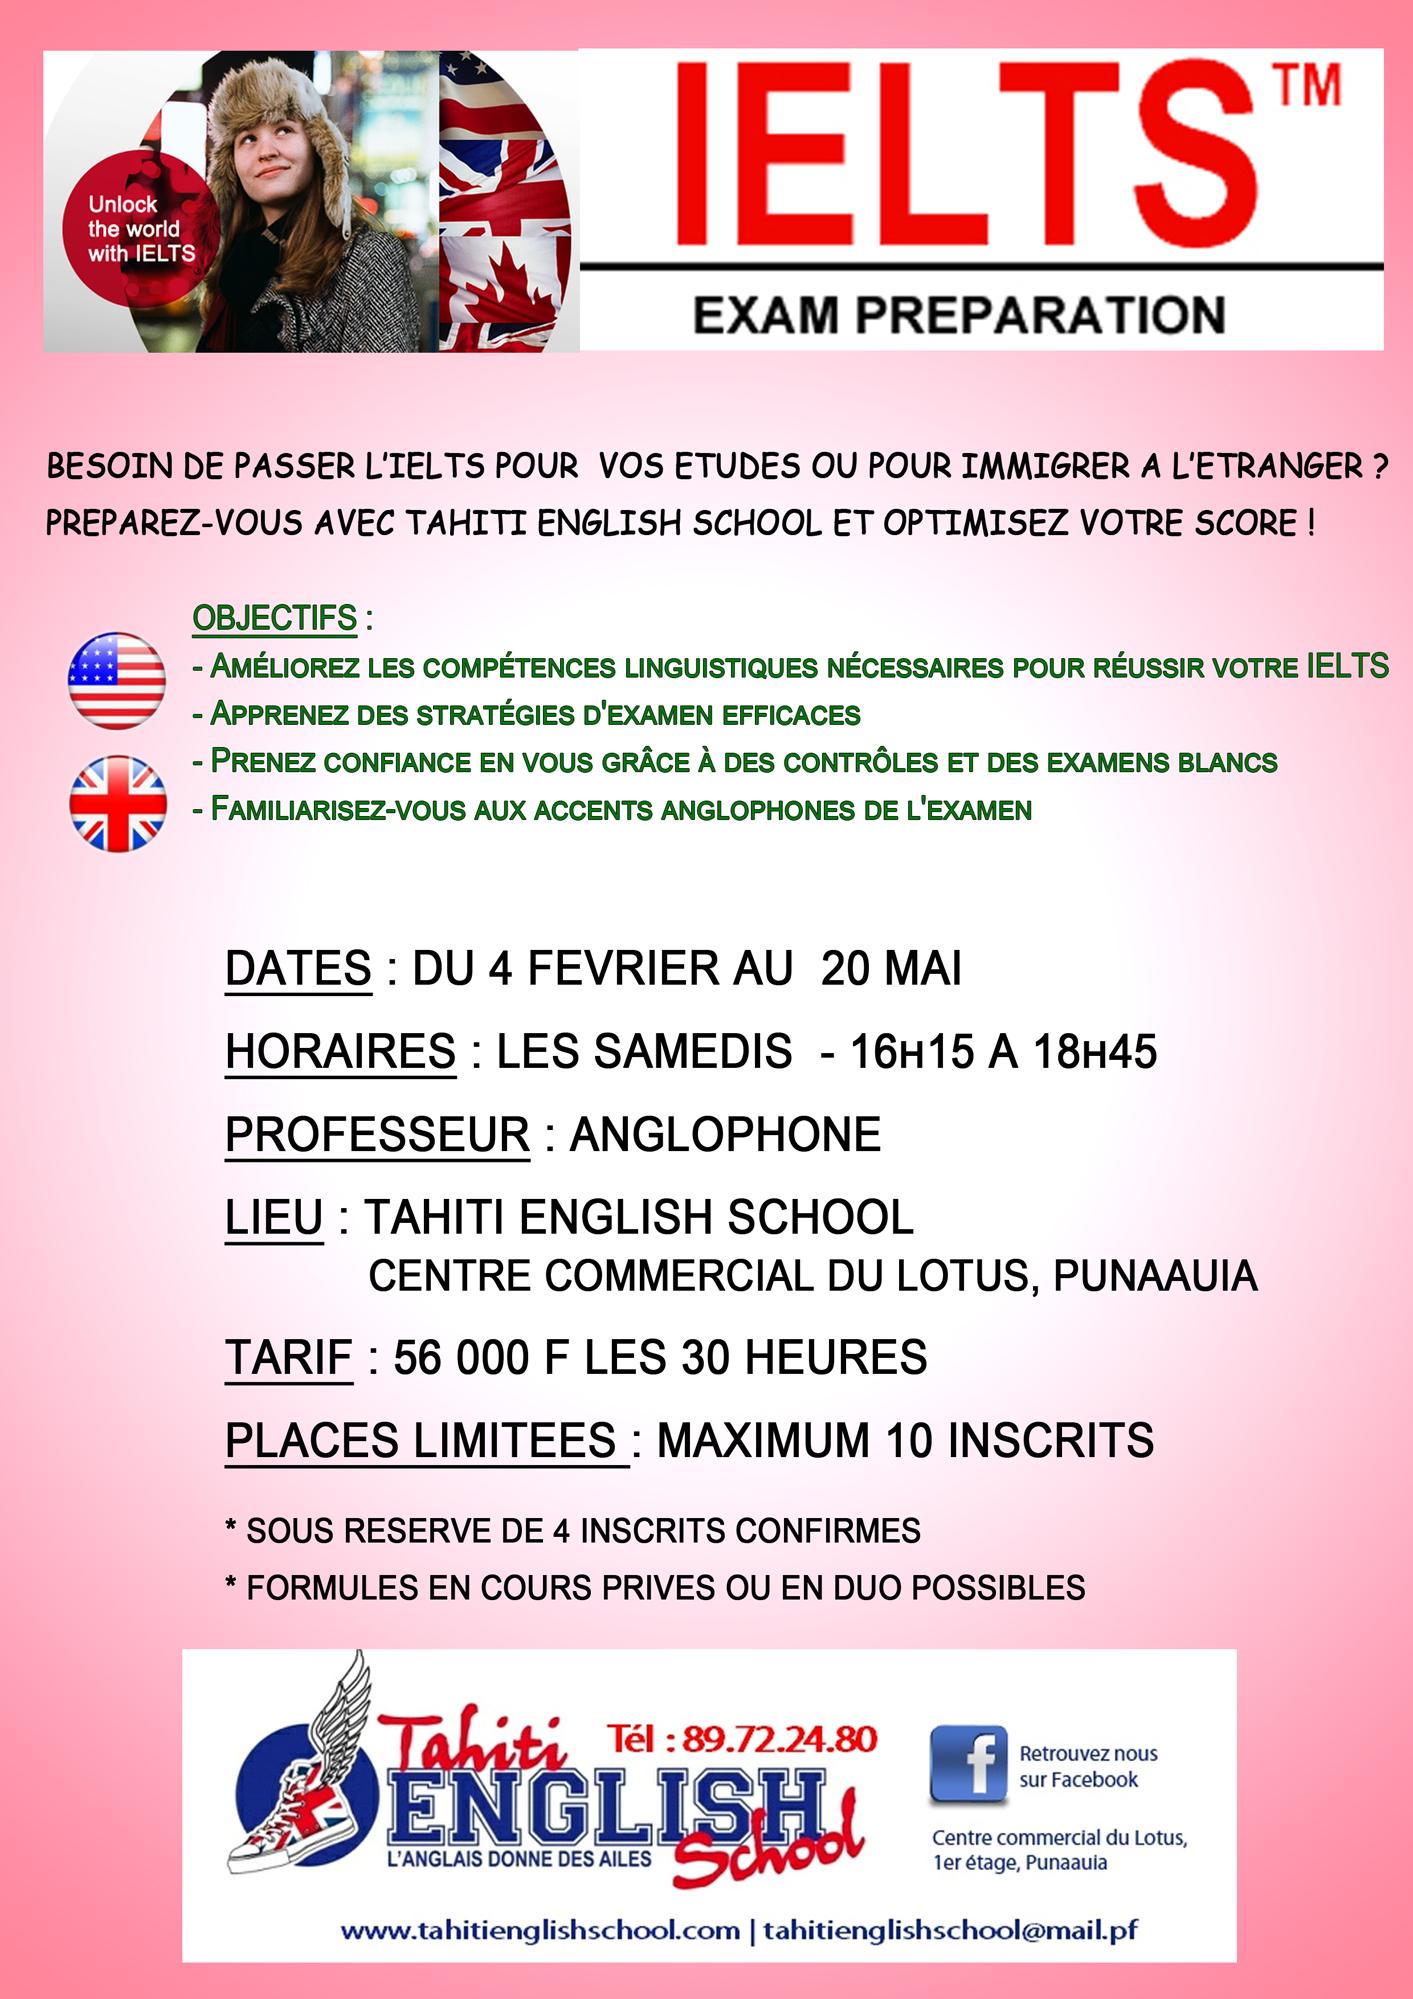 http://www.tahiti-infos.com/agenda/IELTS-Preparez-l-examen-avec-TAHITI-ENGLISH-SCHOOL_ae425680.html